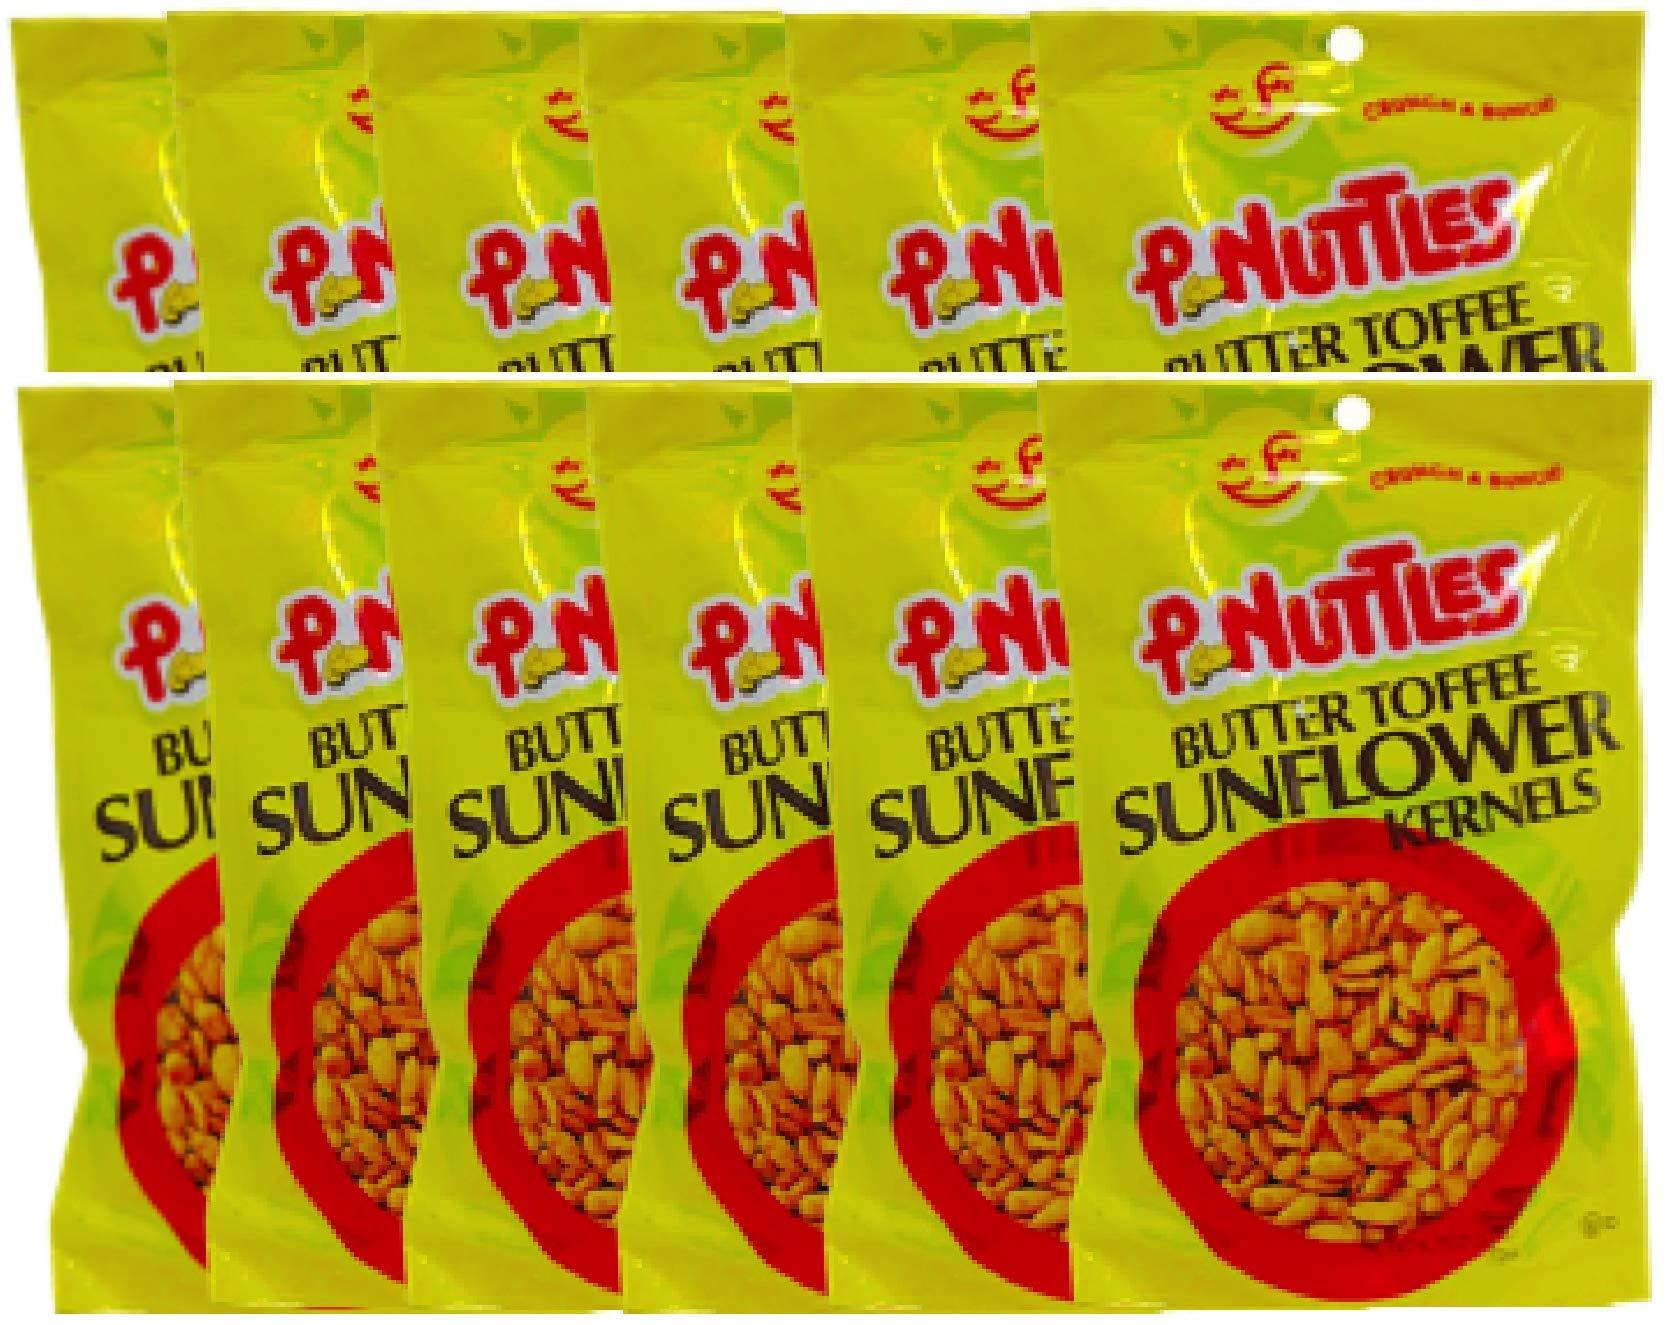 NEW Pnuttles Butter Toffee Sunflower Kernels Net Wt 4.5 Oz (12) by Peanuttles